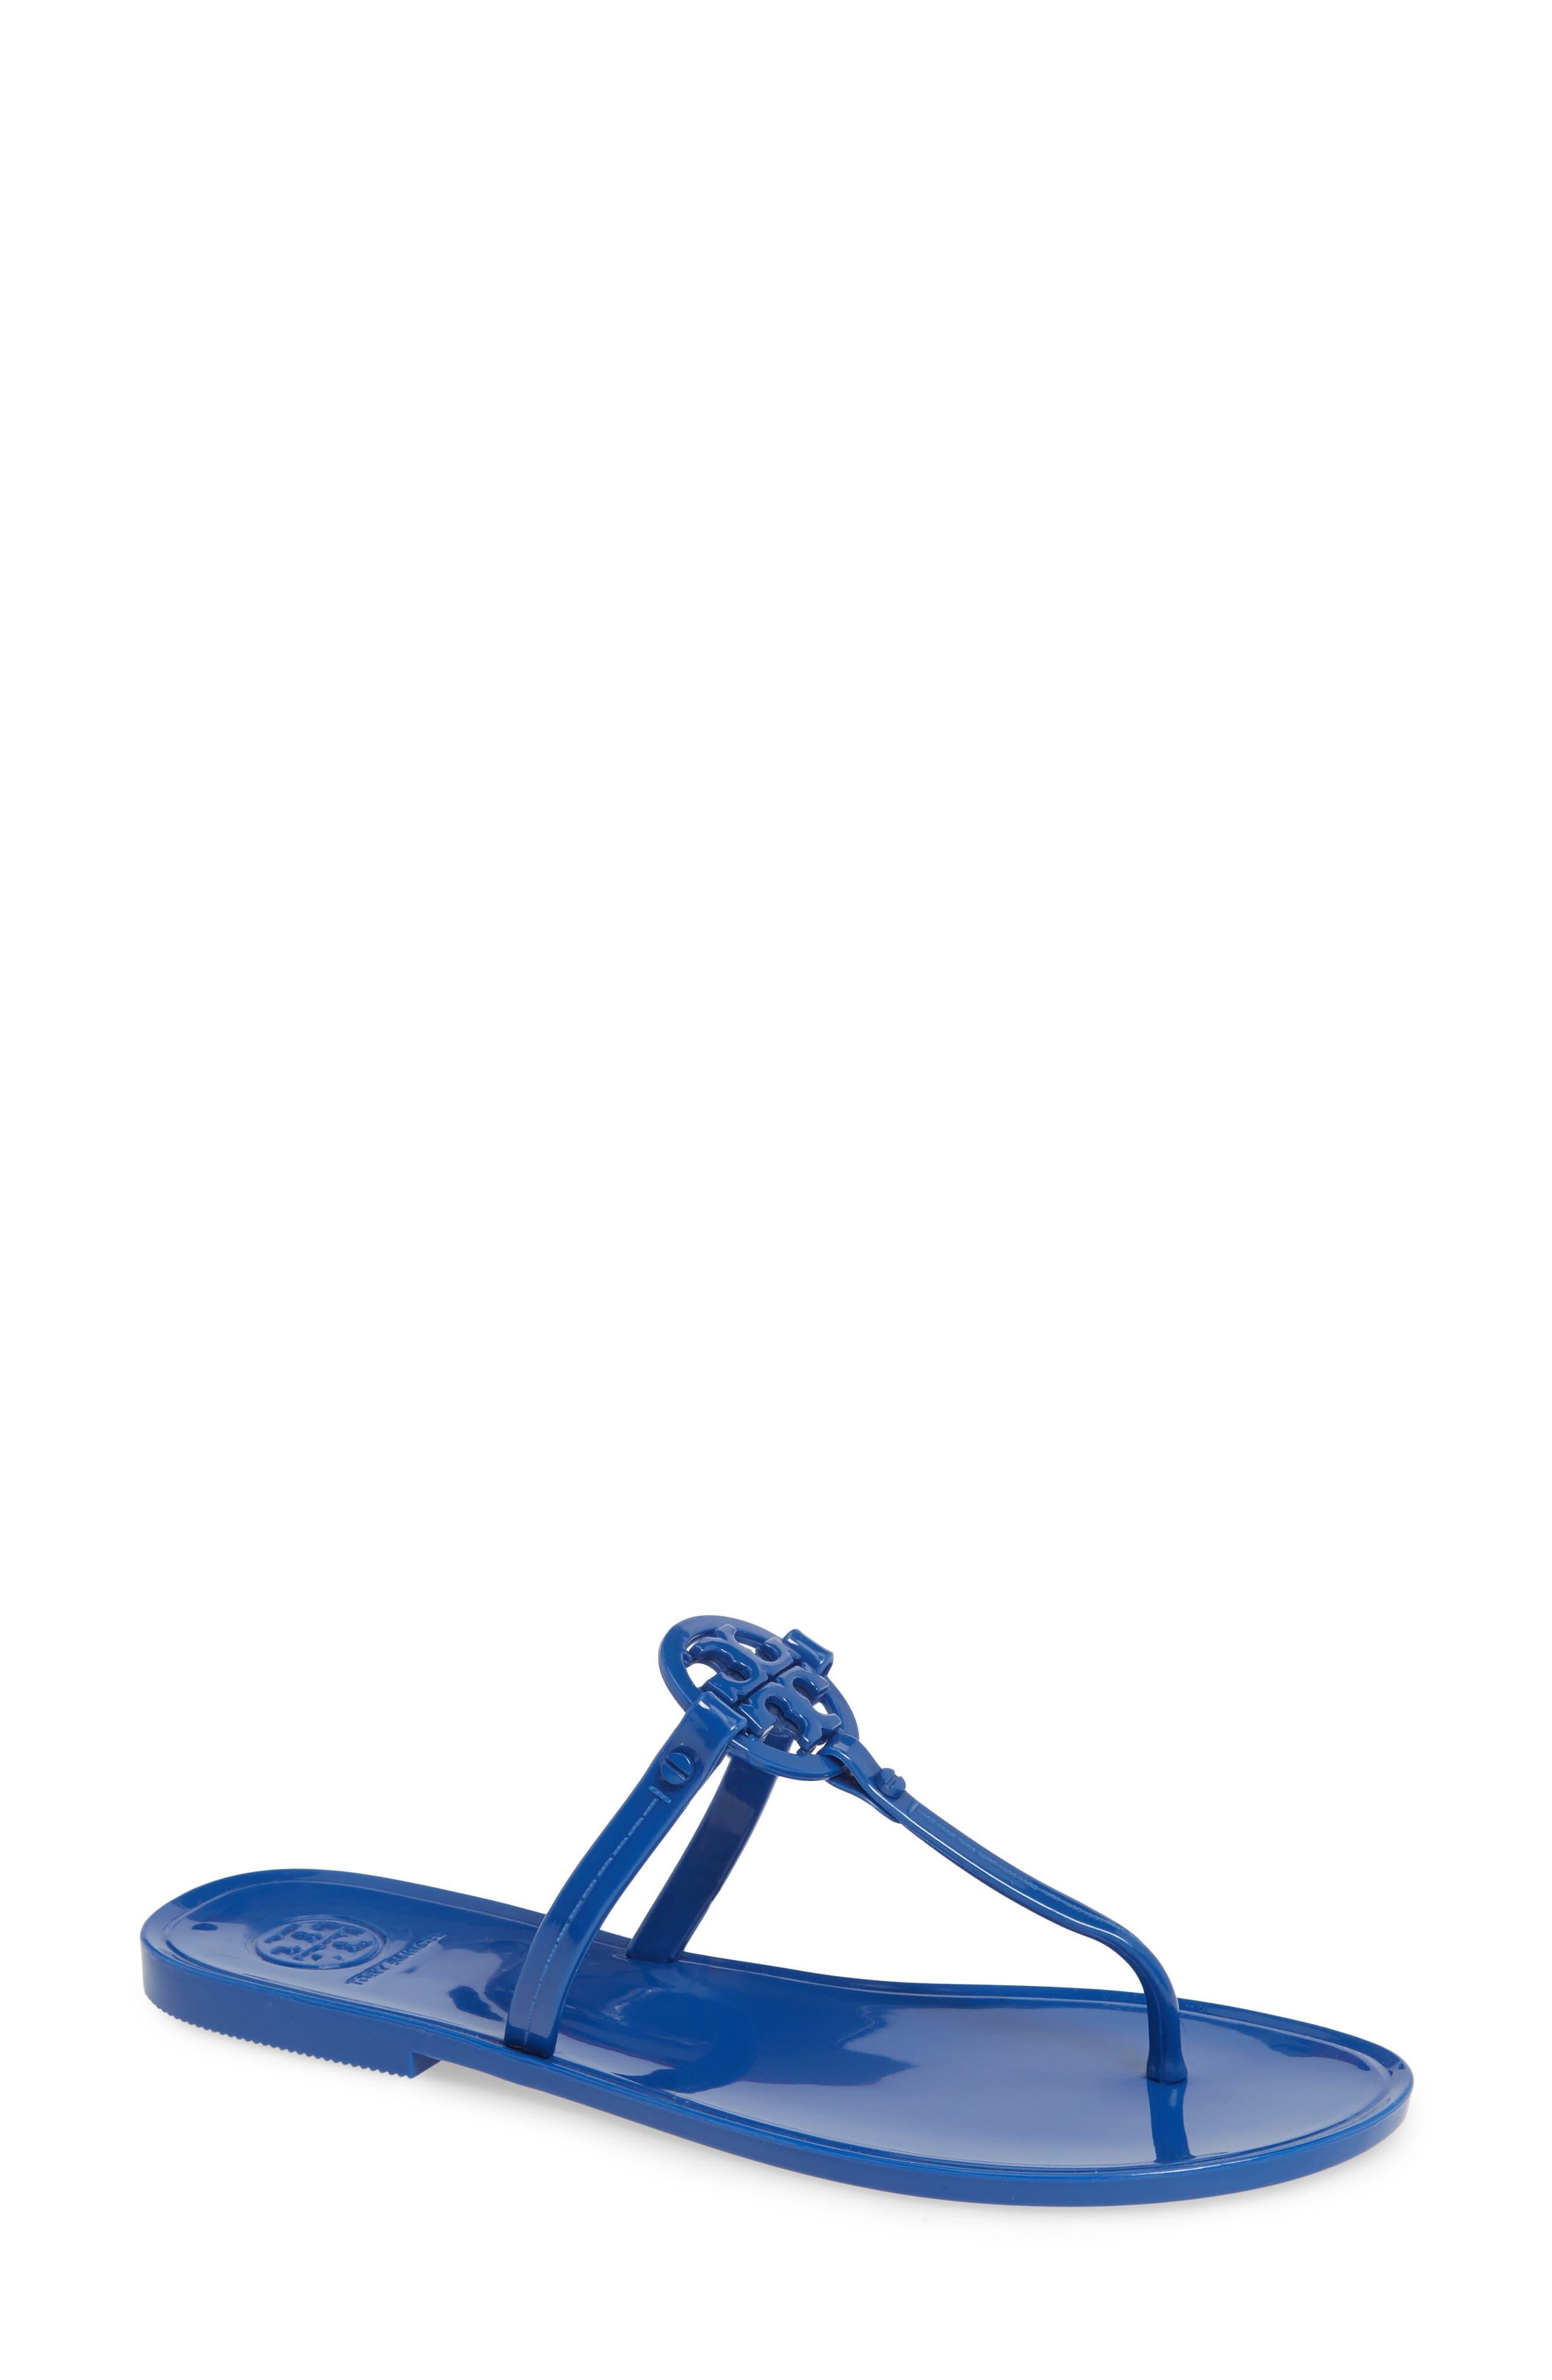 5d04130c5fc4 Women s Tory Burch Sandals